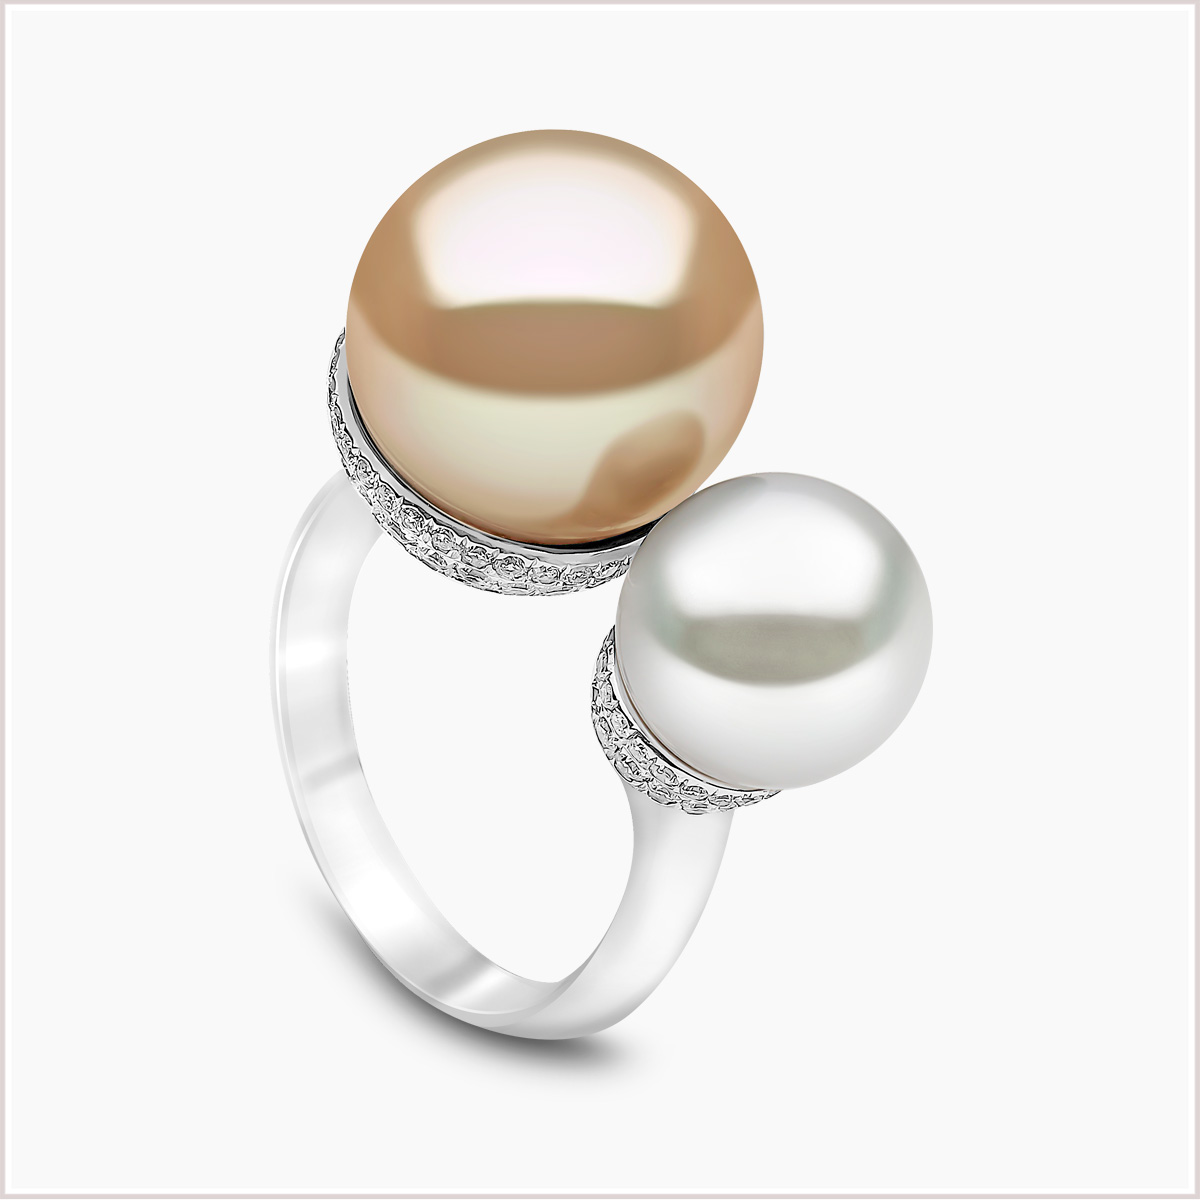 Yoko London Novus South Sea and Diamomd Pearl Ring